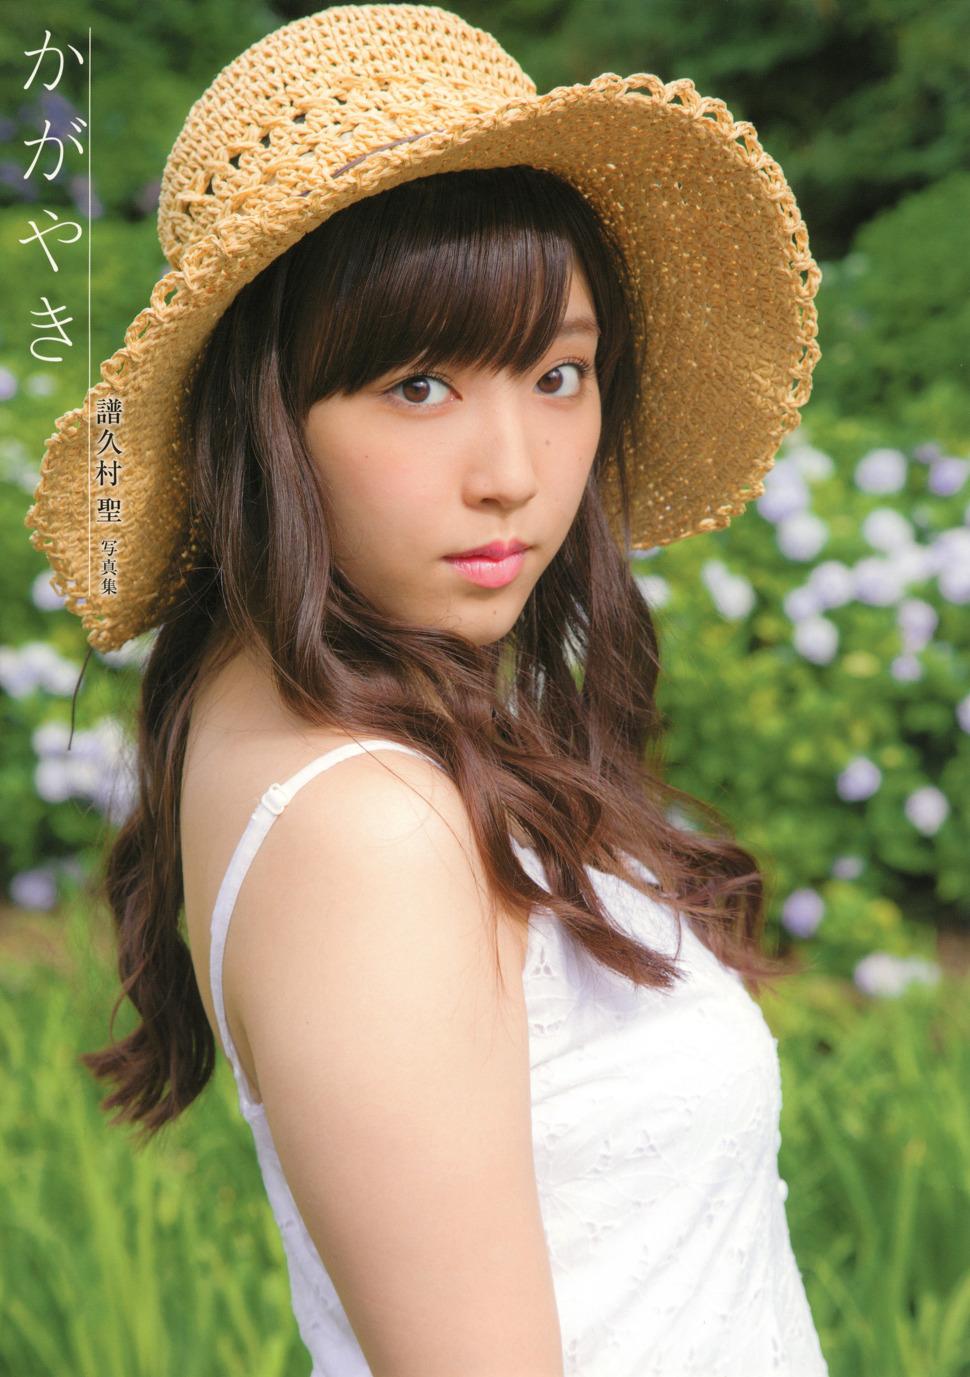 Fukumura Mizuki (譜久村聖) Kagayaki Photobook Cover